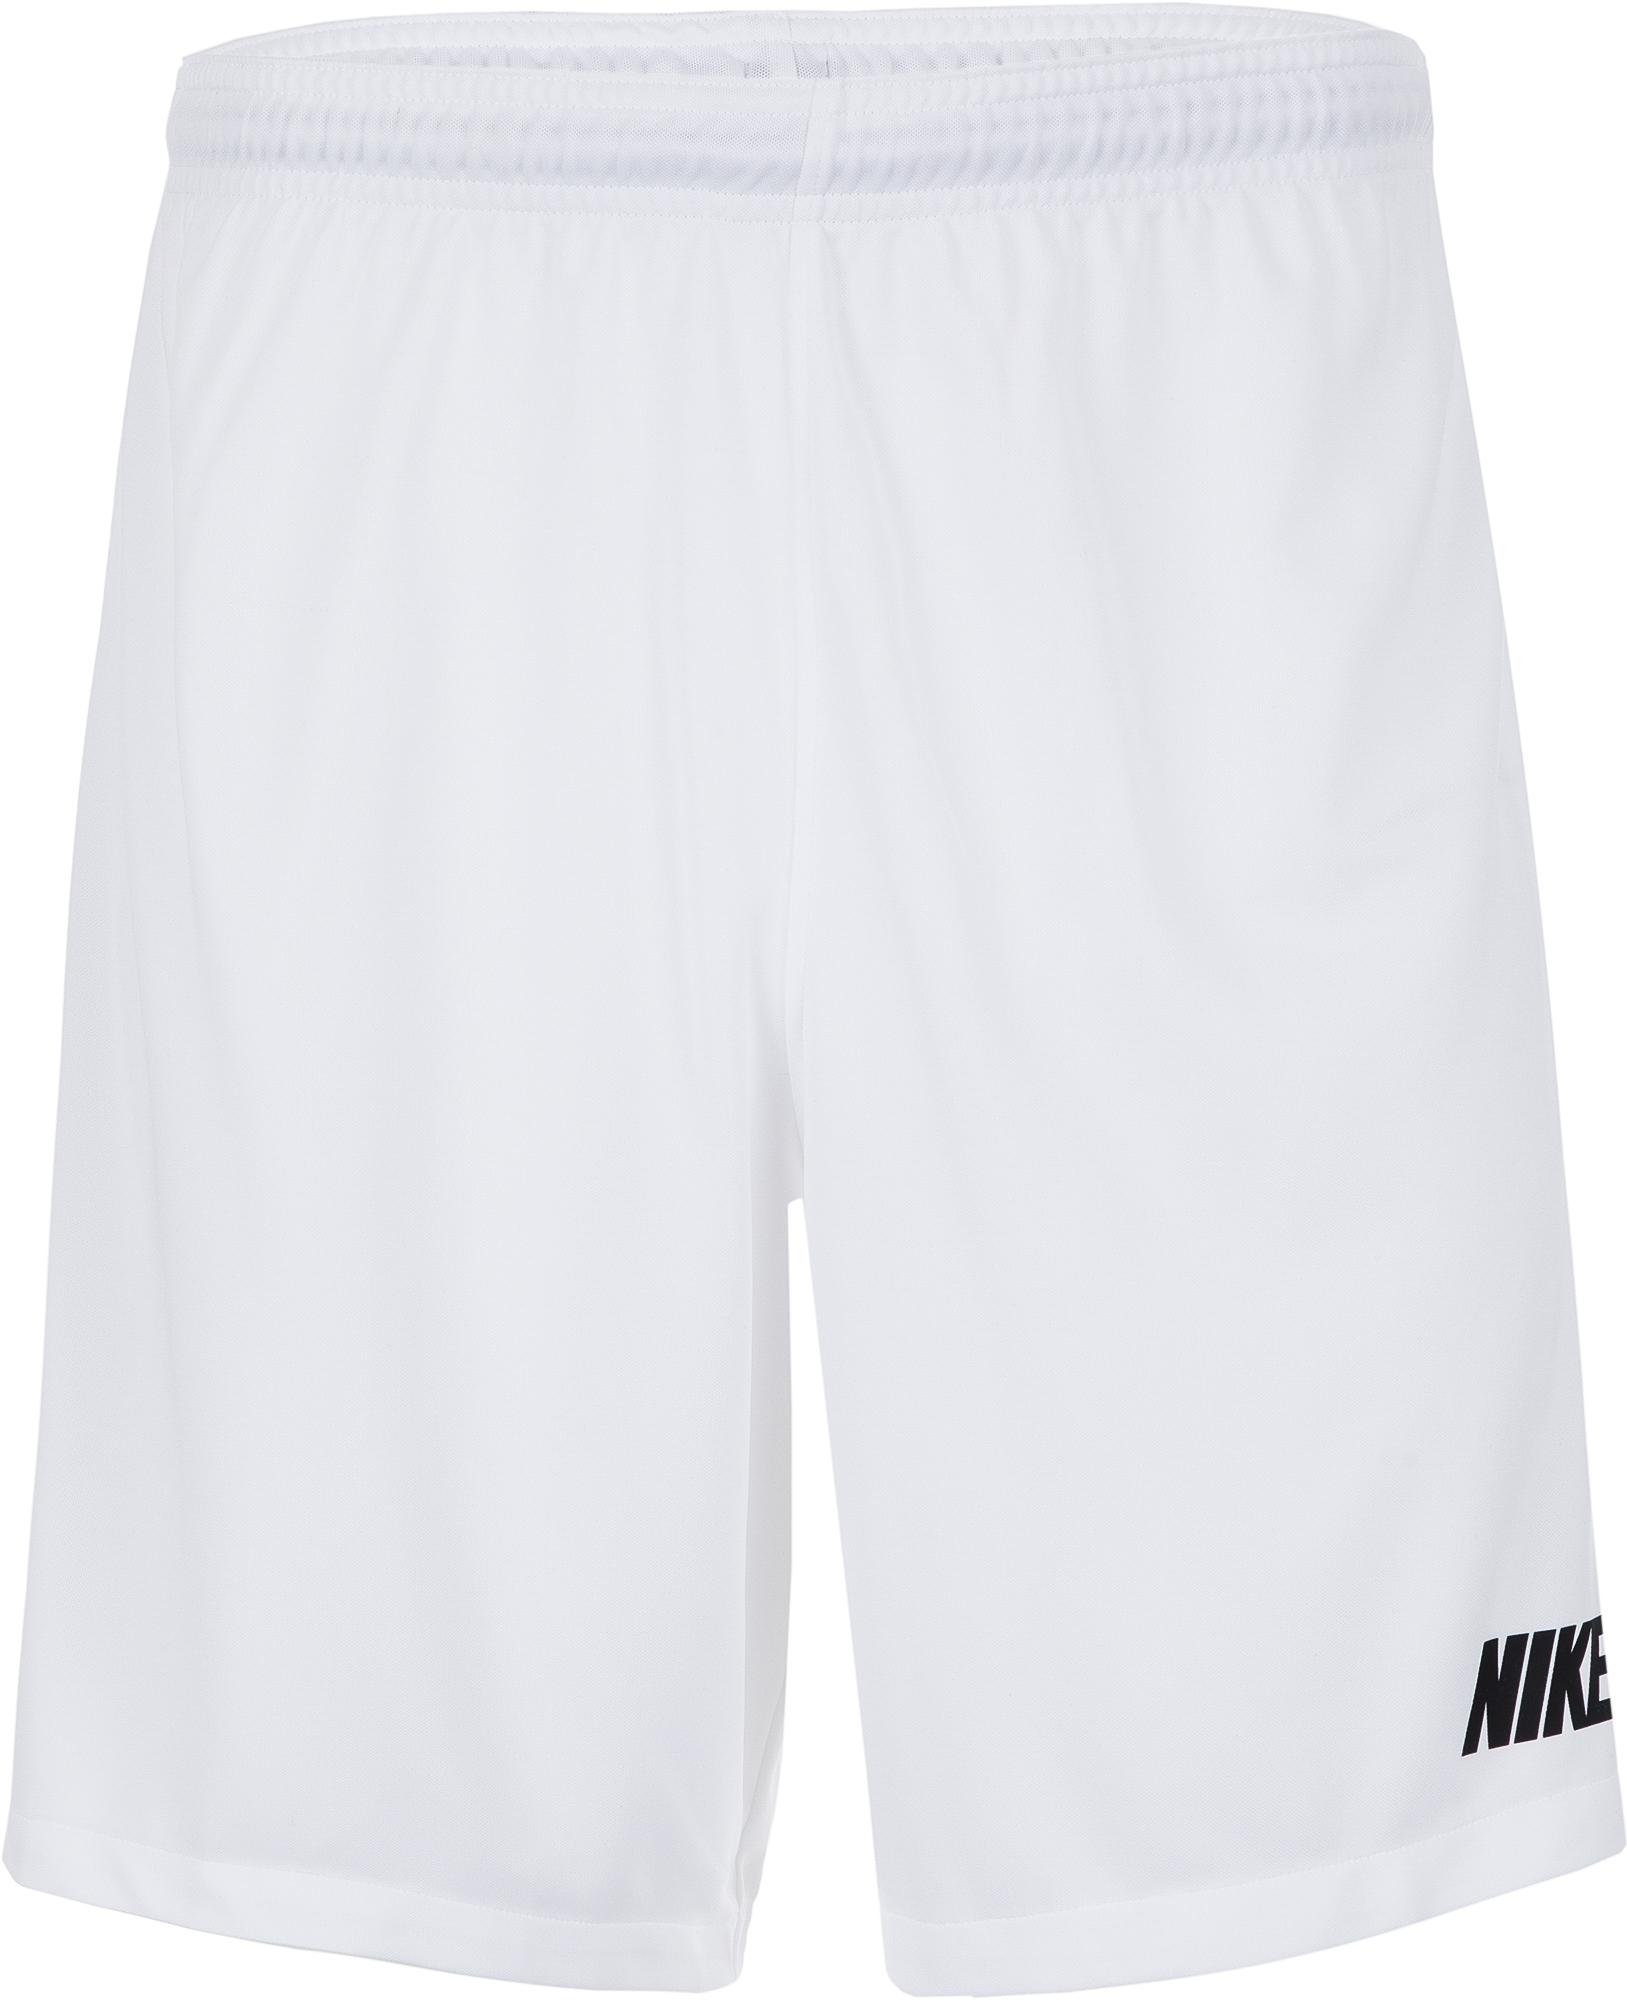 Nike Шорты мужские  Dri-FIT Squad, размер 52-54